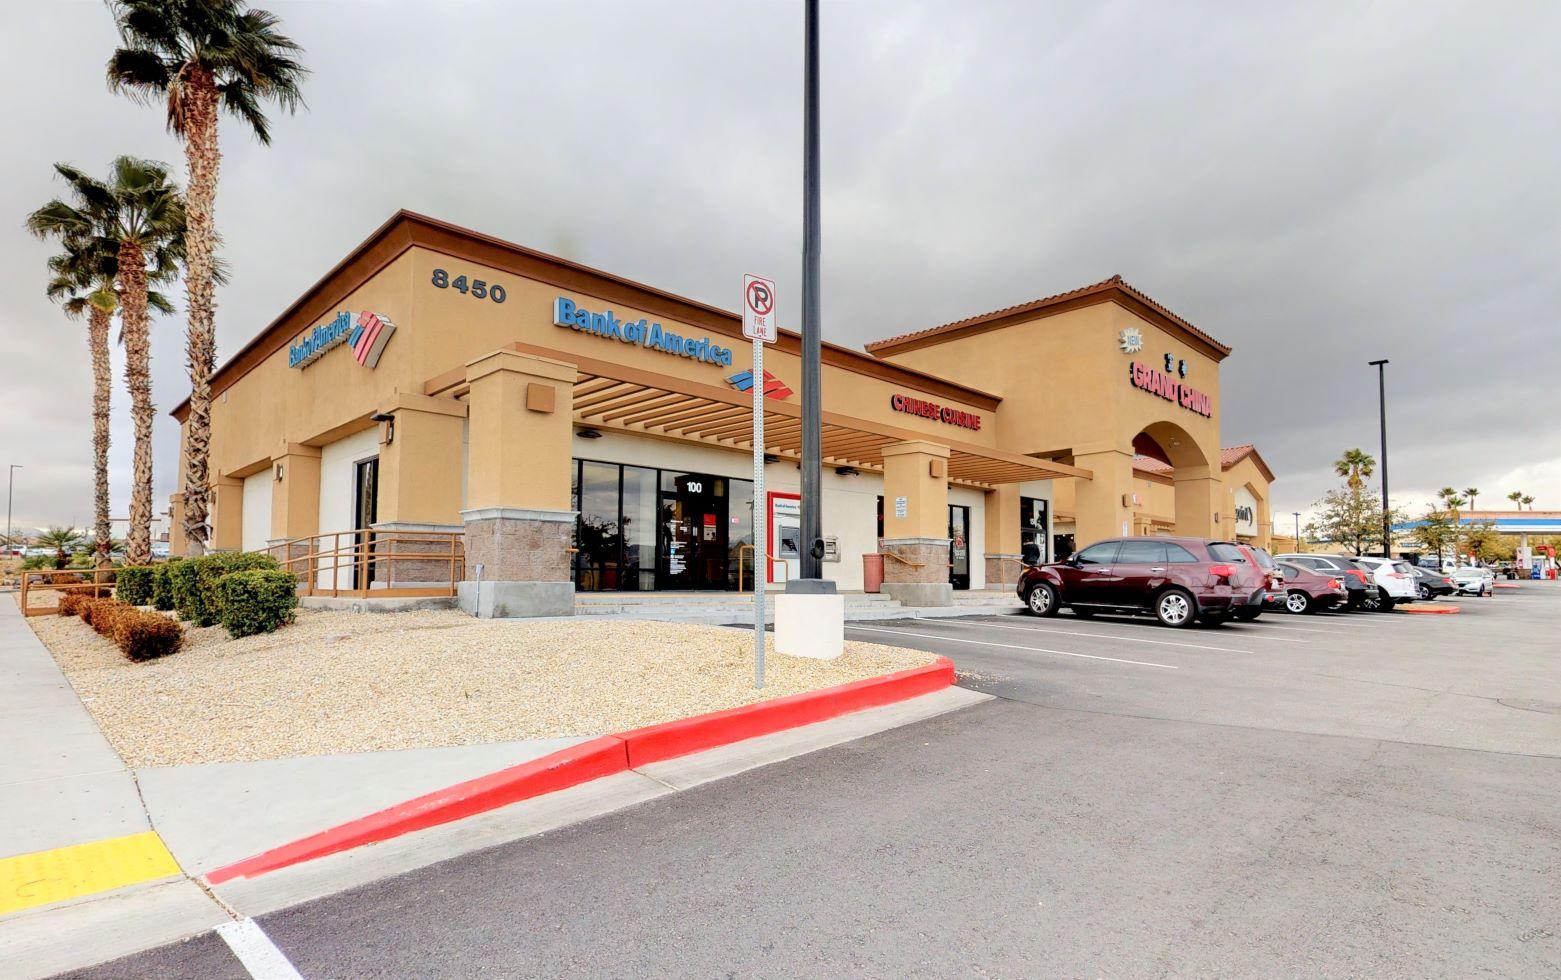 Bank of America financial center with drive-thru ATM   8450 W Farm Rd, Las Vegas, NV 89131